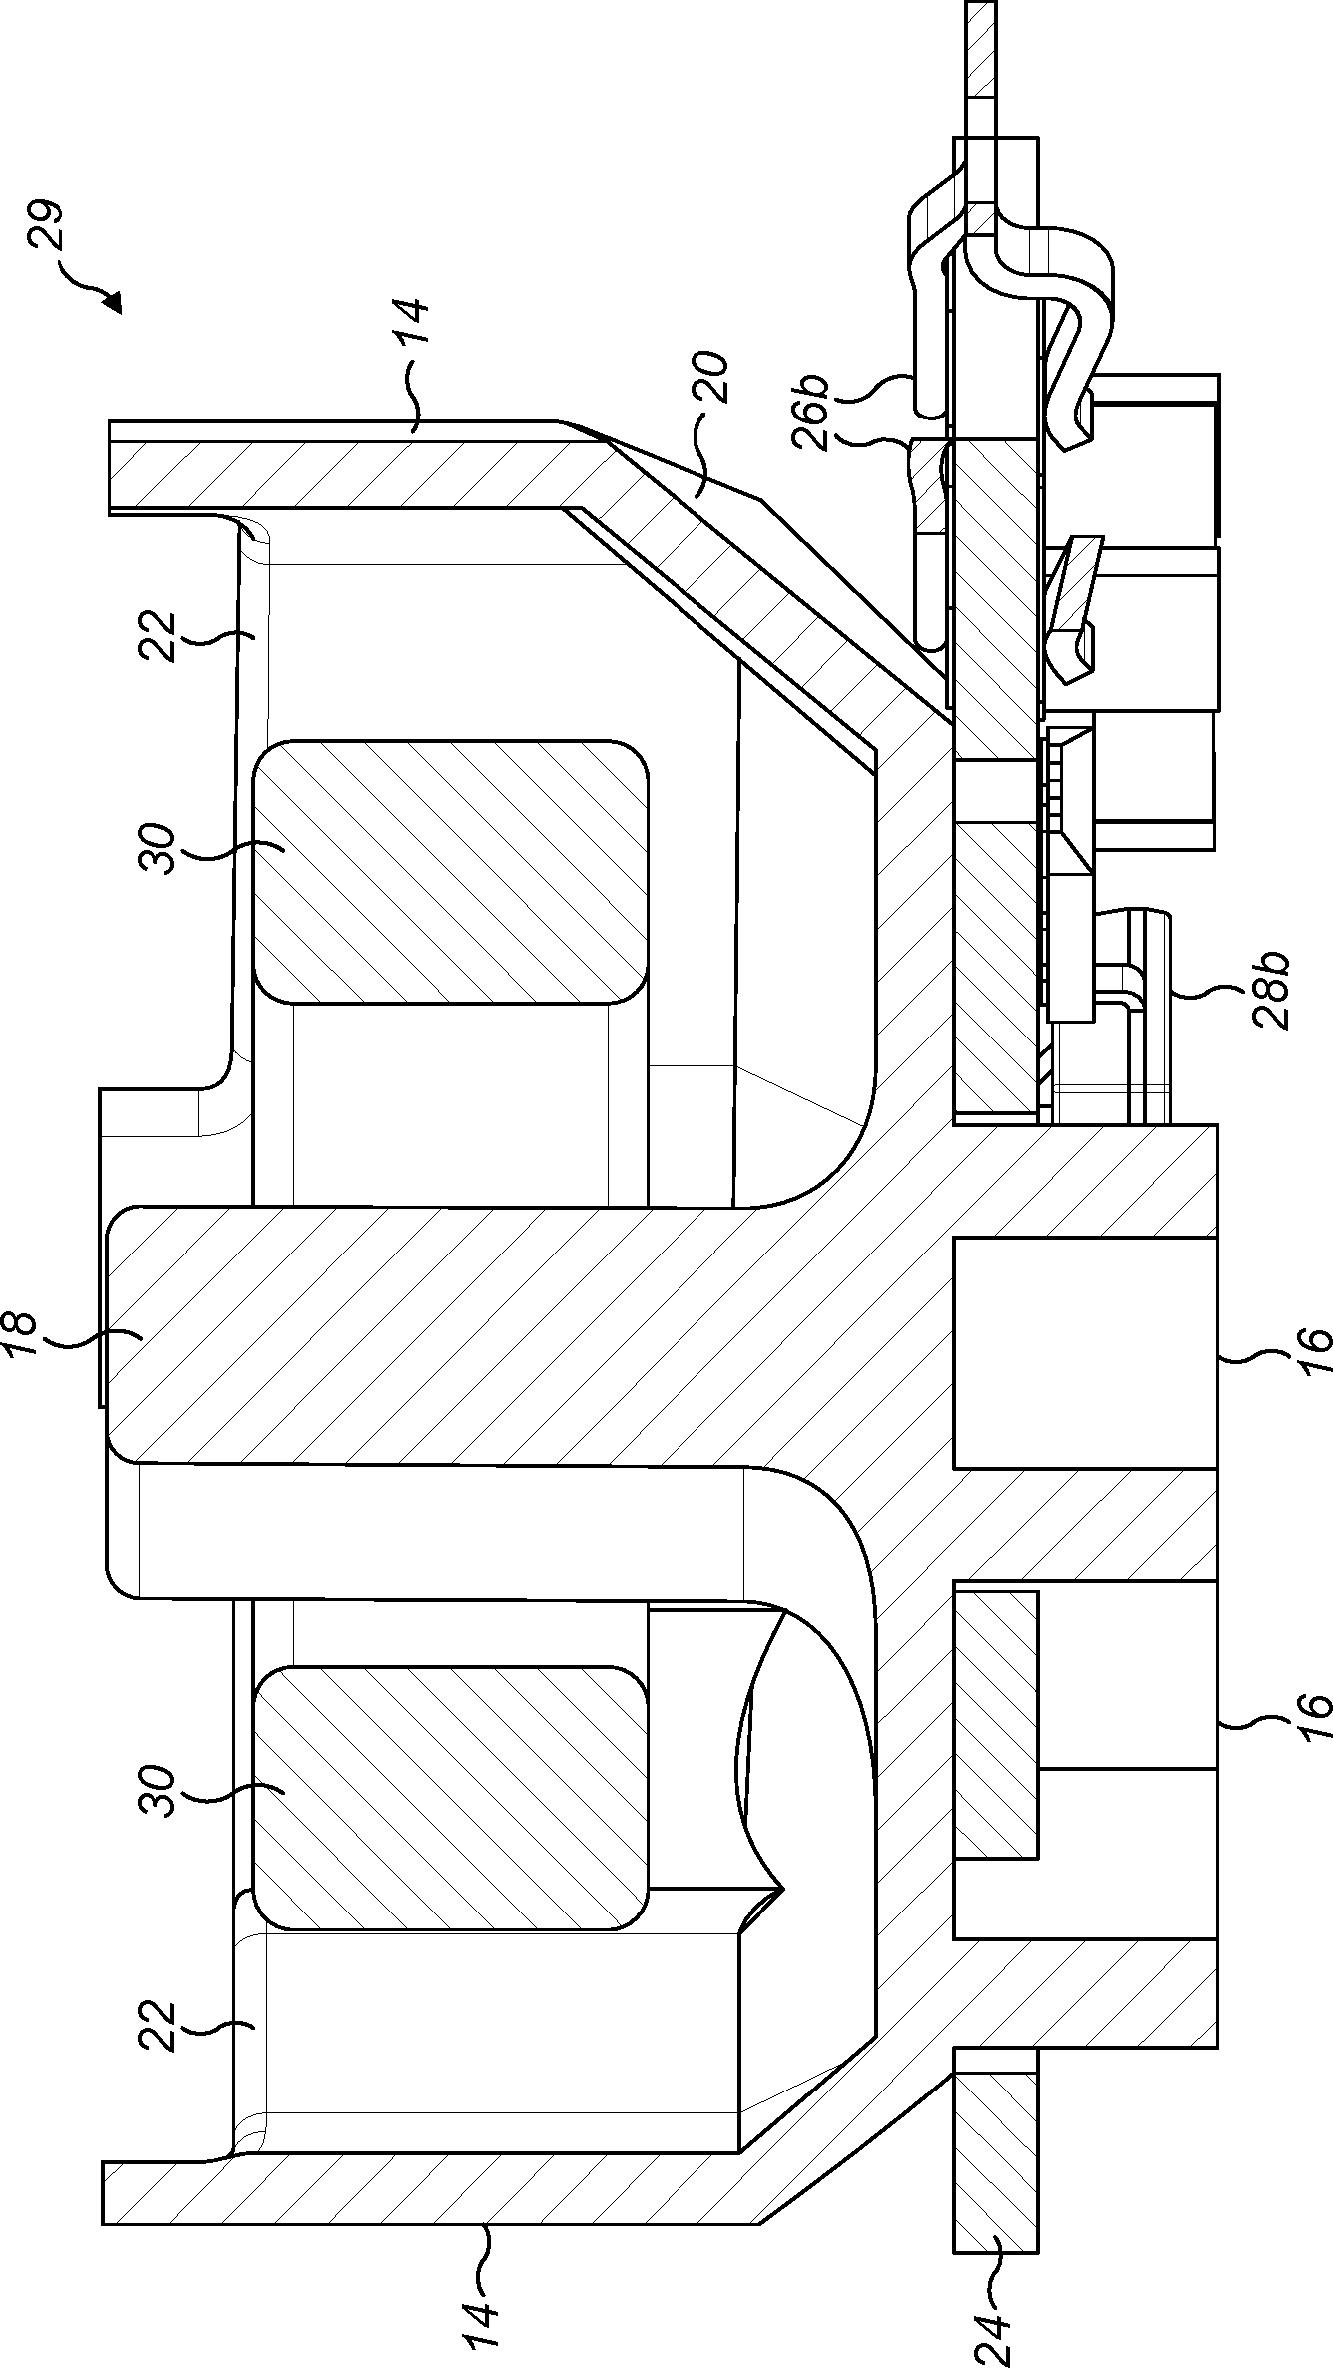 Figure GB2555832A_D0009